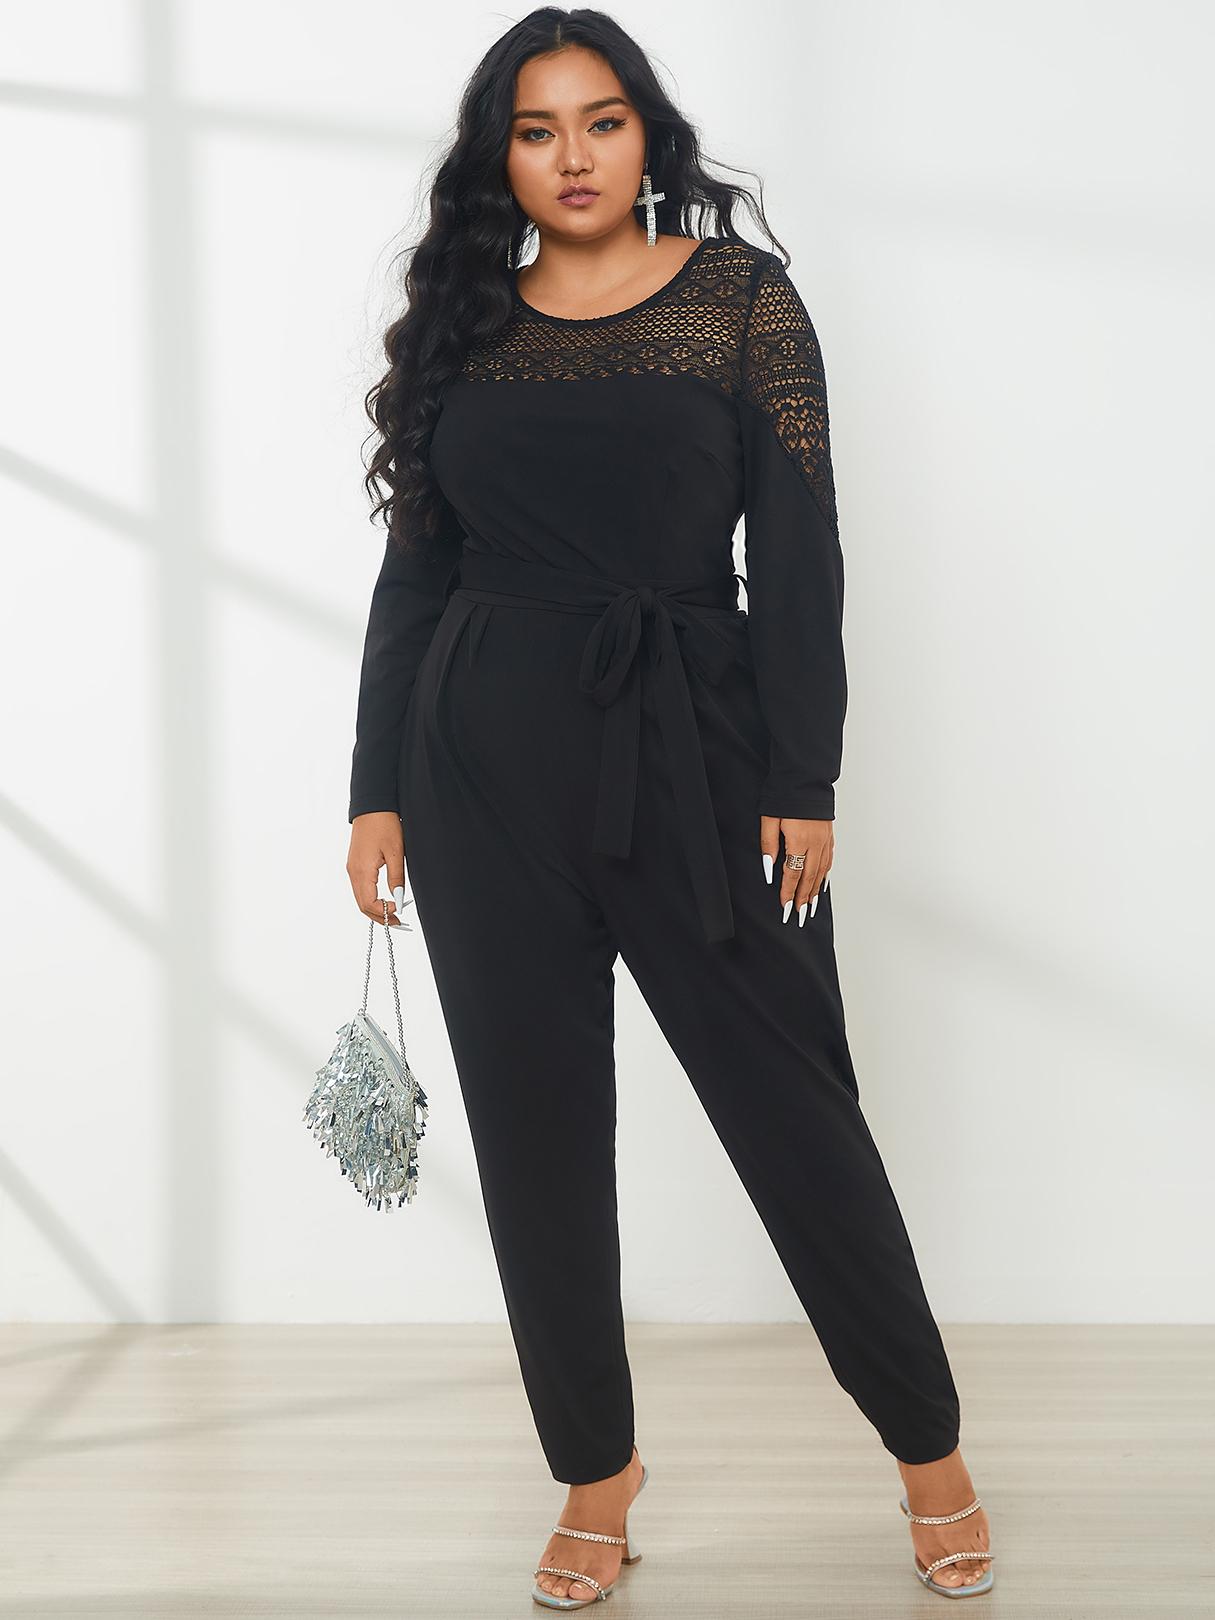 YOINS Plus Size Halloween Crew Neck Lace Patchwork Long Sleeves Jumpsuit